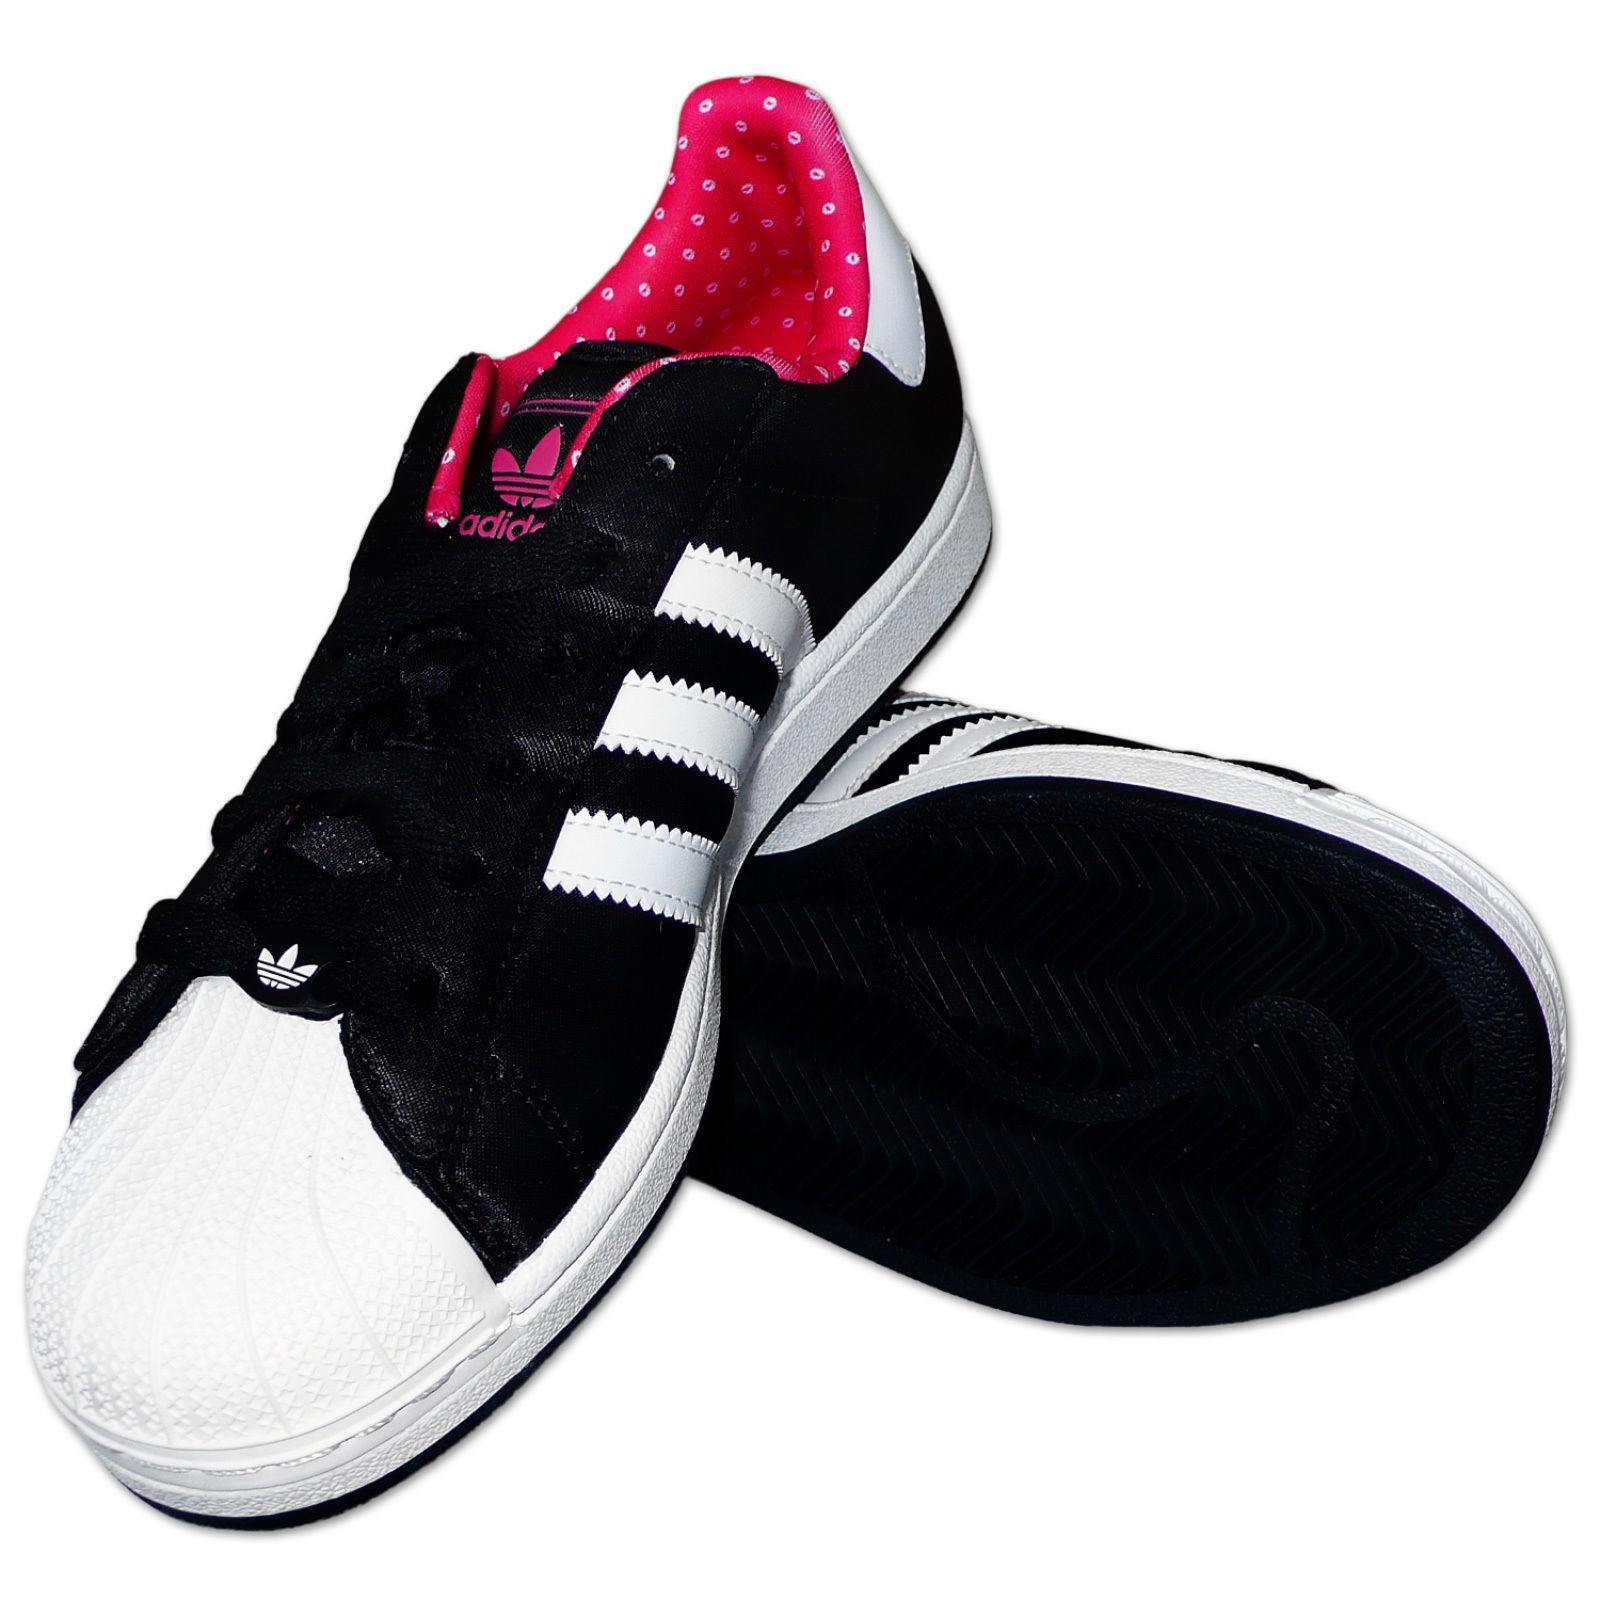 adidas anzug damen pink adidas originals gazelle og w. Black Bedroom Furniture Sets. Home Design Ideas